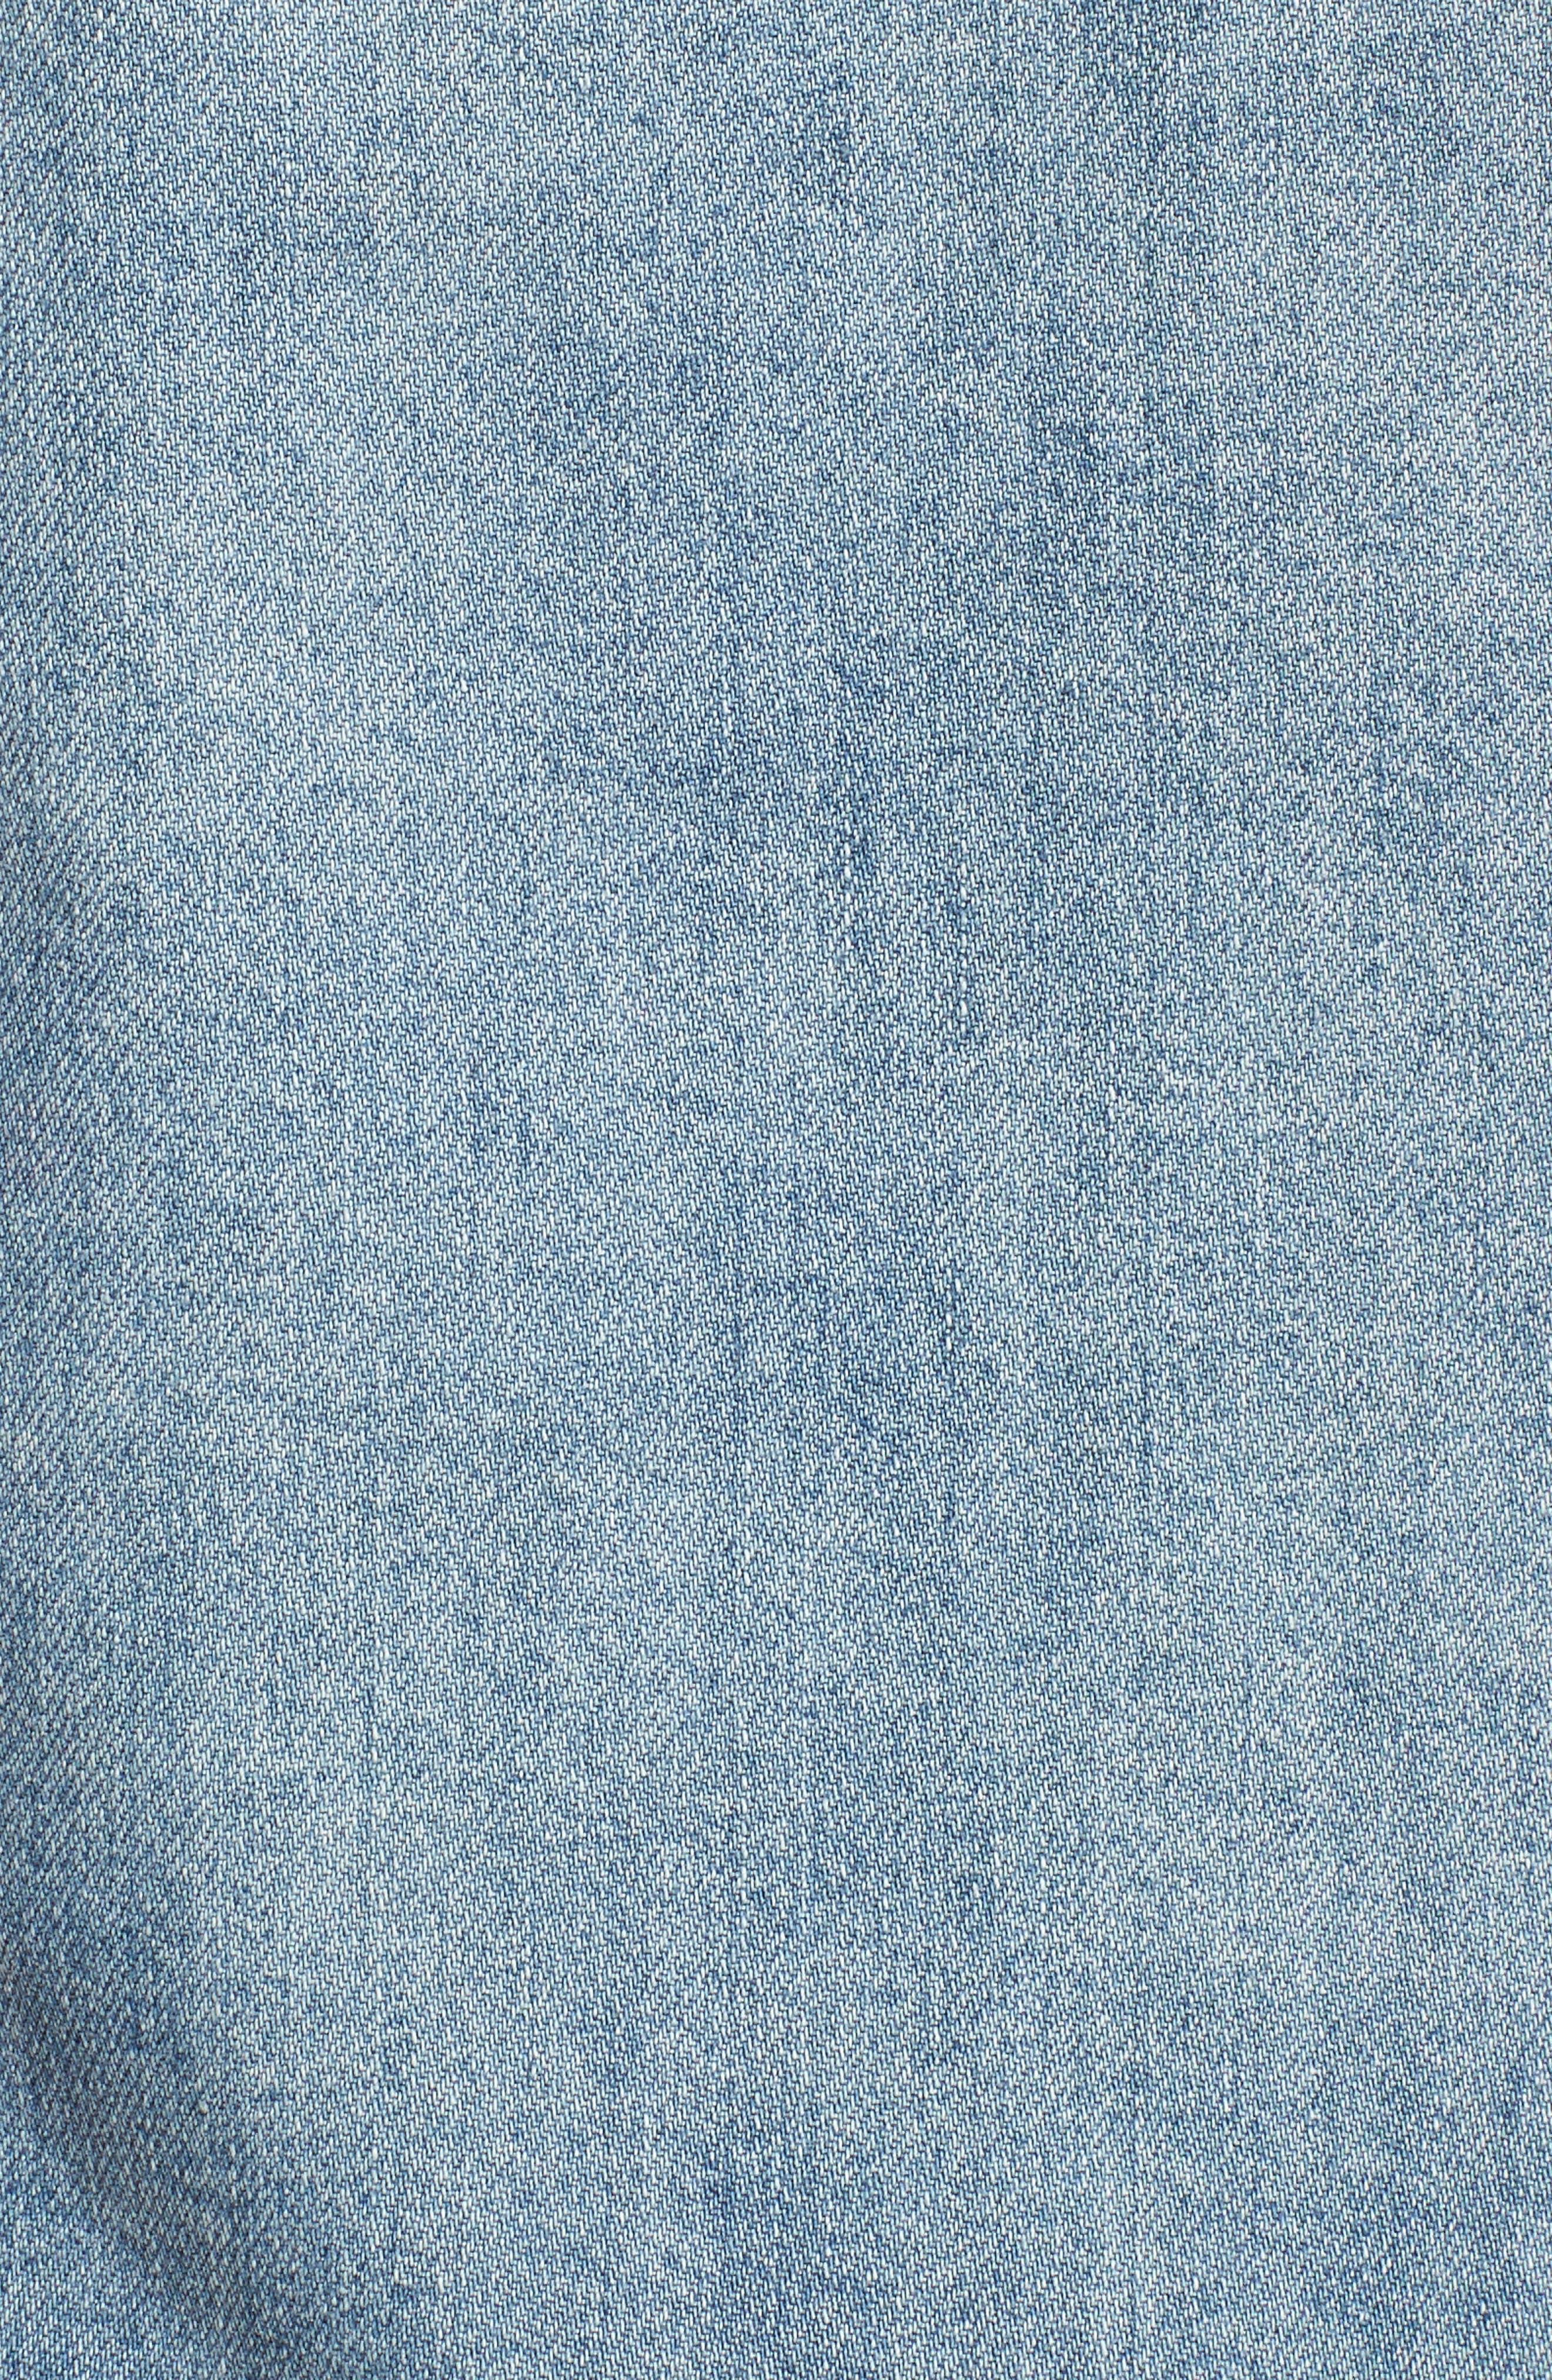 Ruffle Denim Jacket,                             Alternate thumbnail 5, color,                             Austin Wash